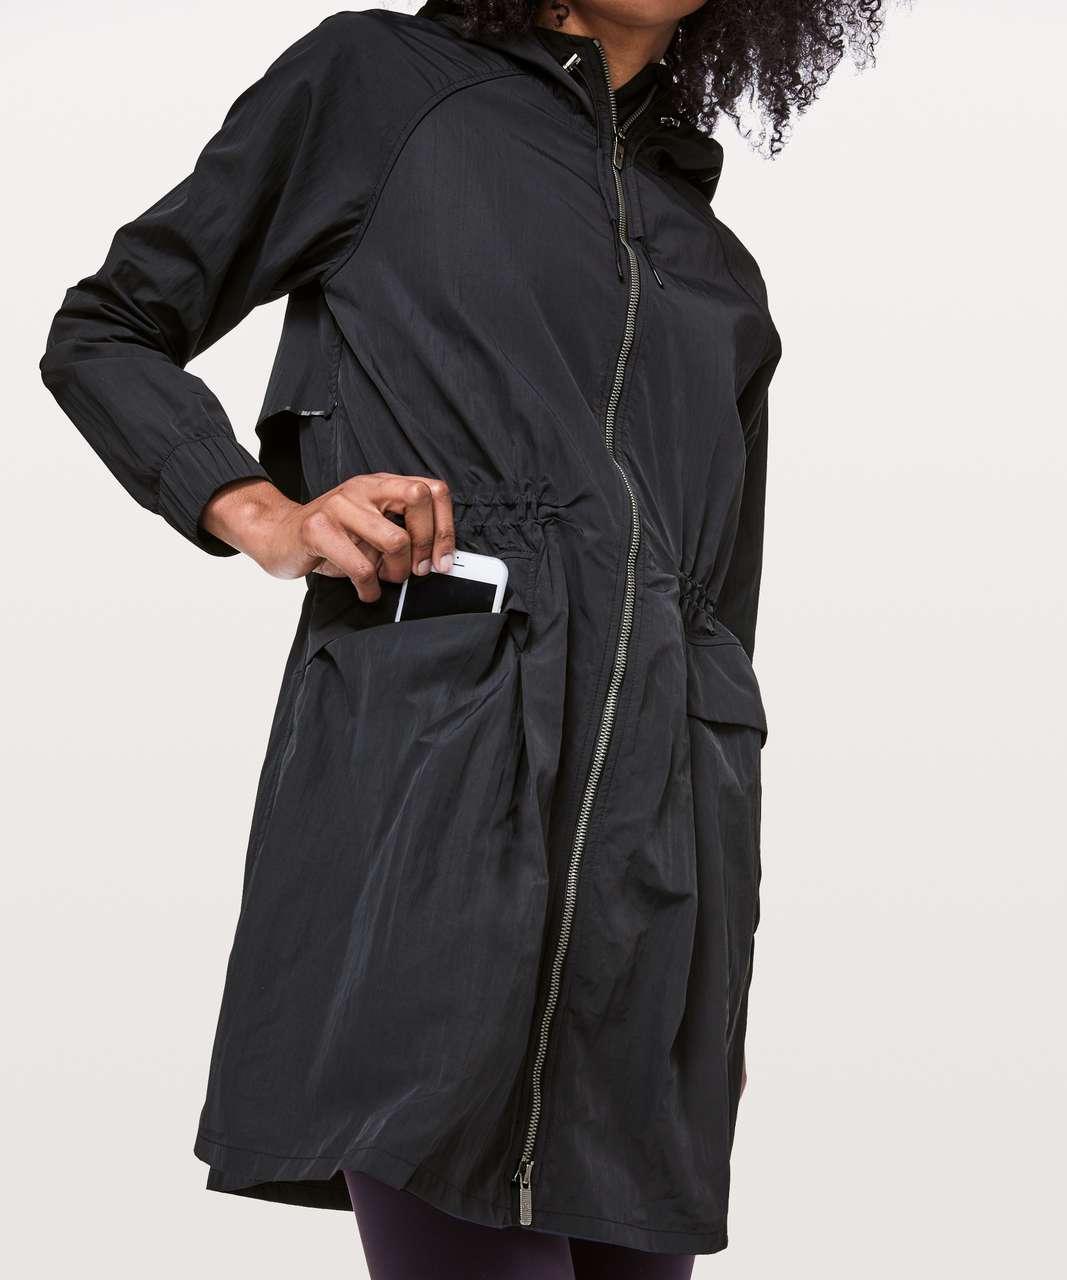 Lululemon Pack & Glyde Jacket - Black